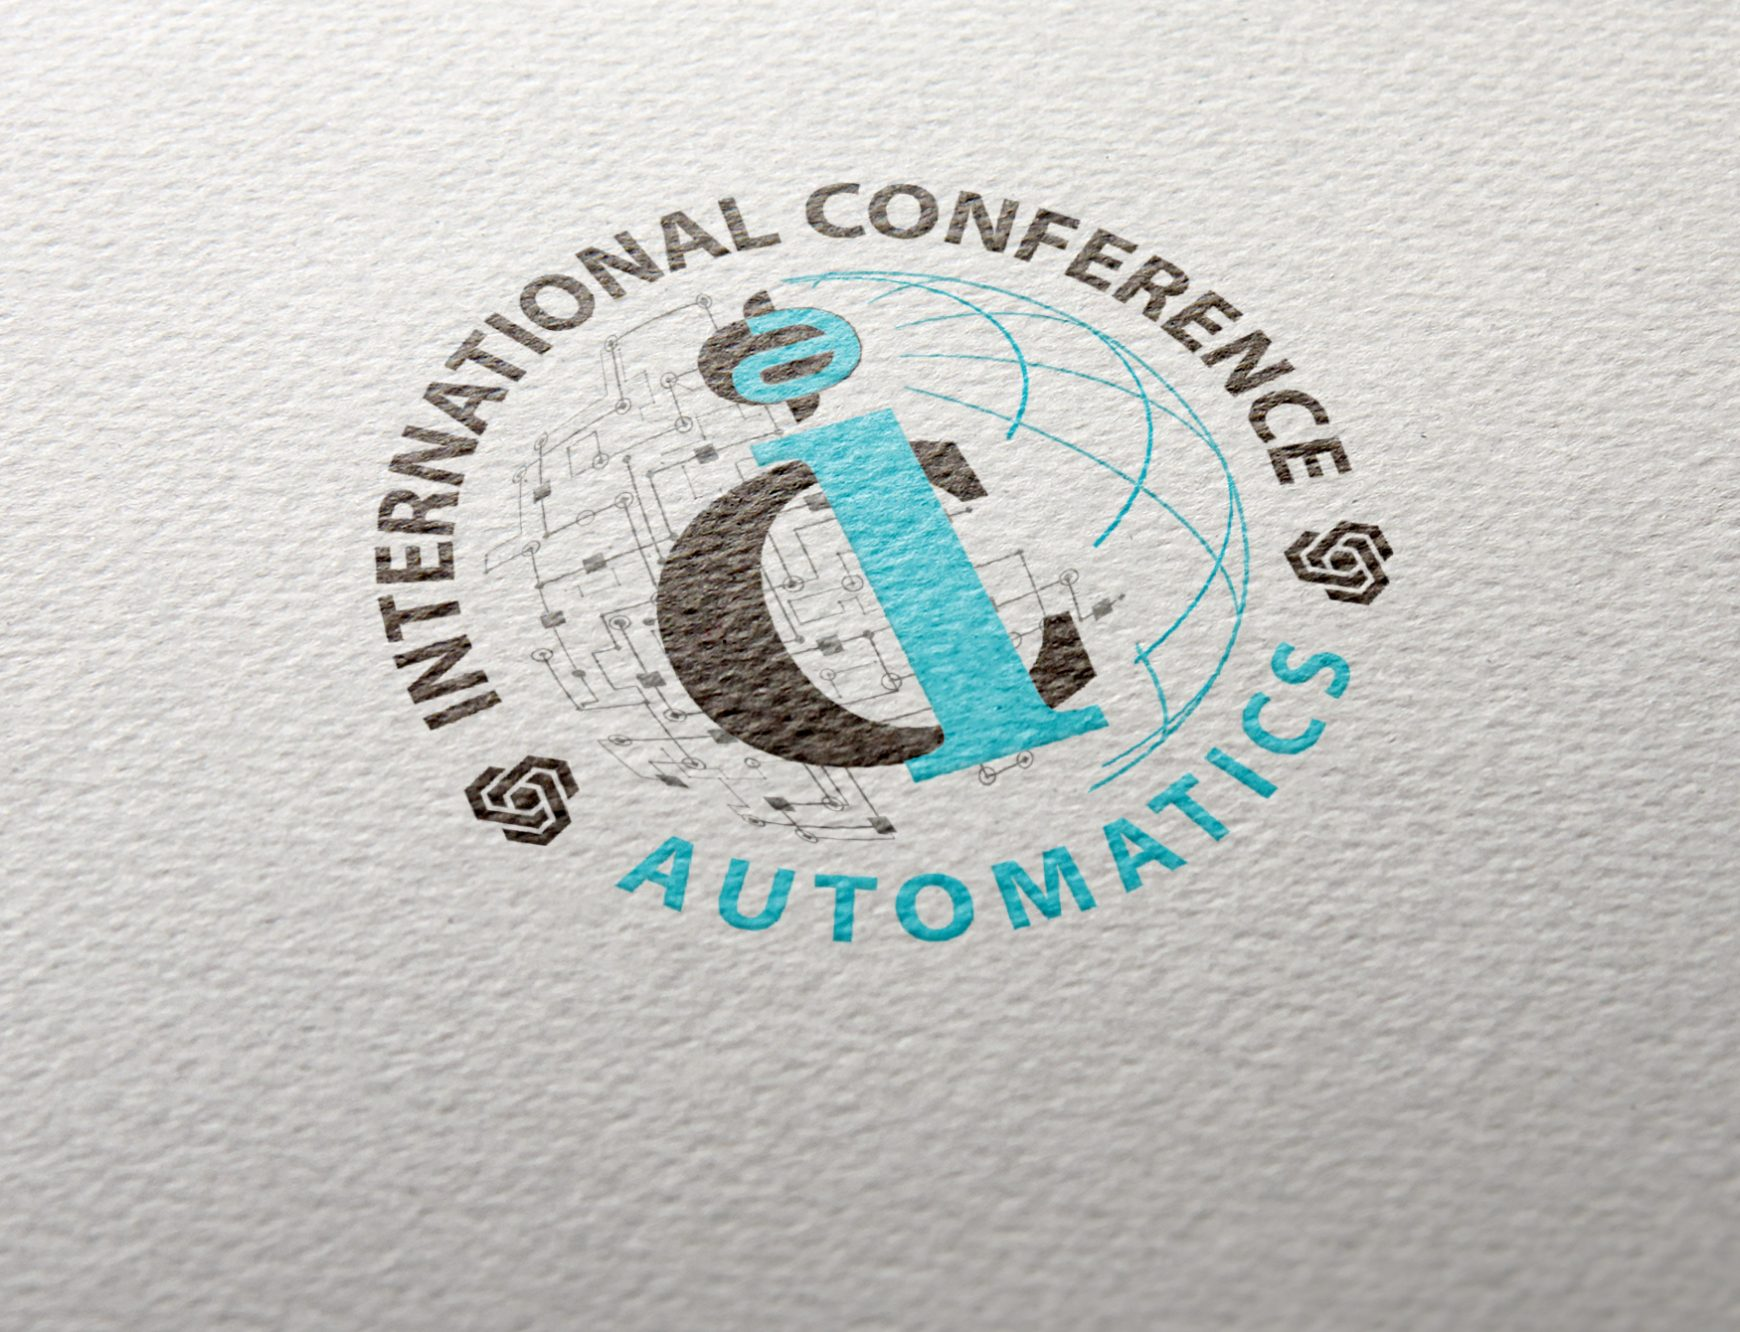 Logo for TU, Automatics